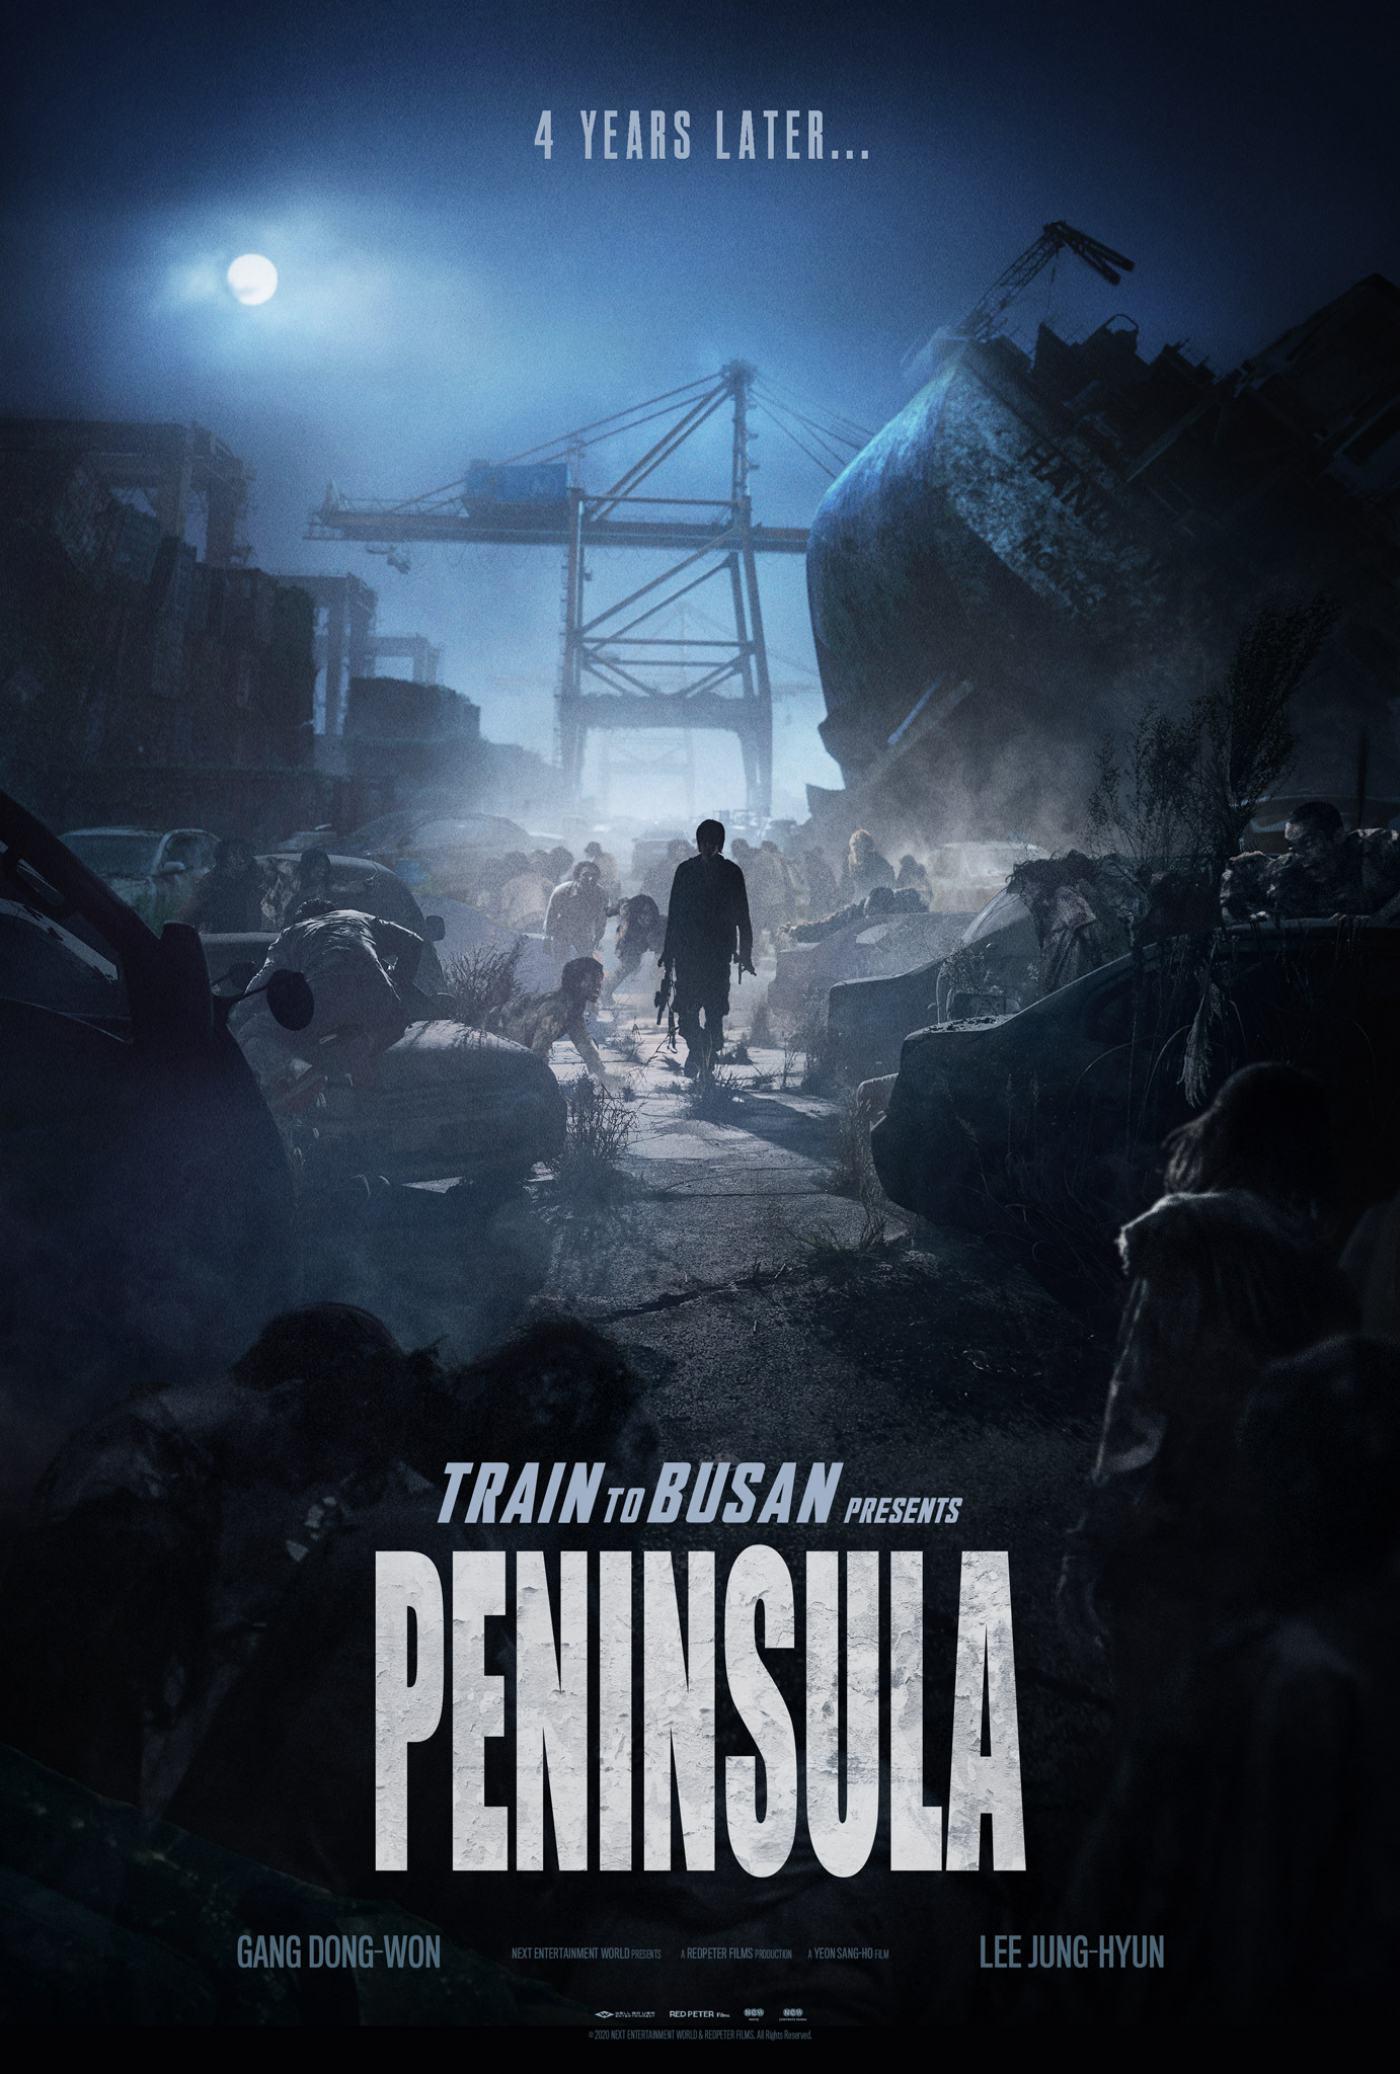 Train to Busan Presents: Peninsula Poster #1